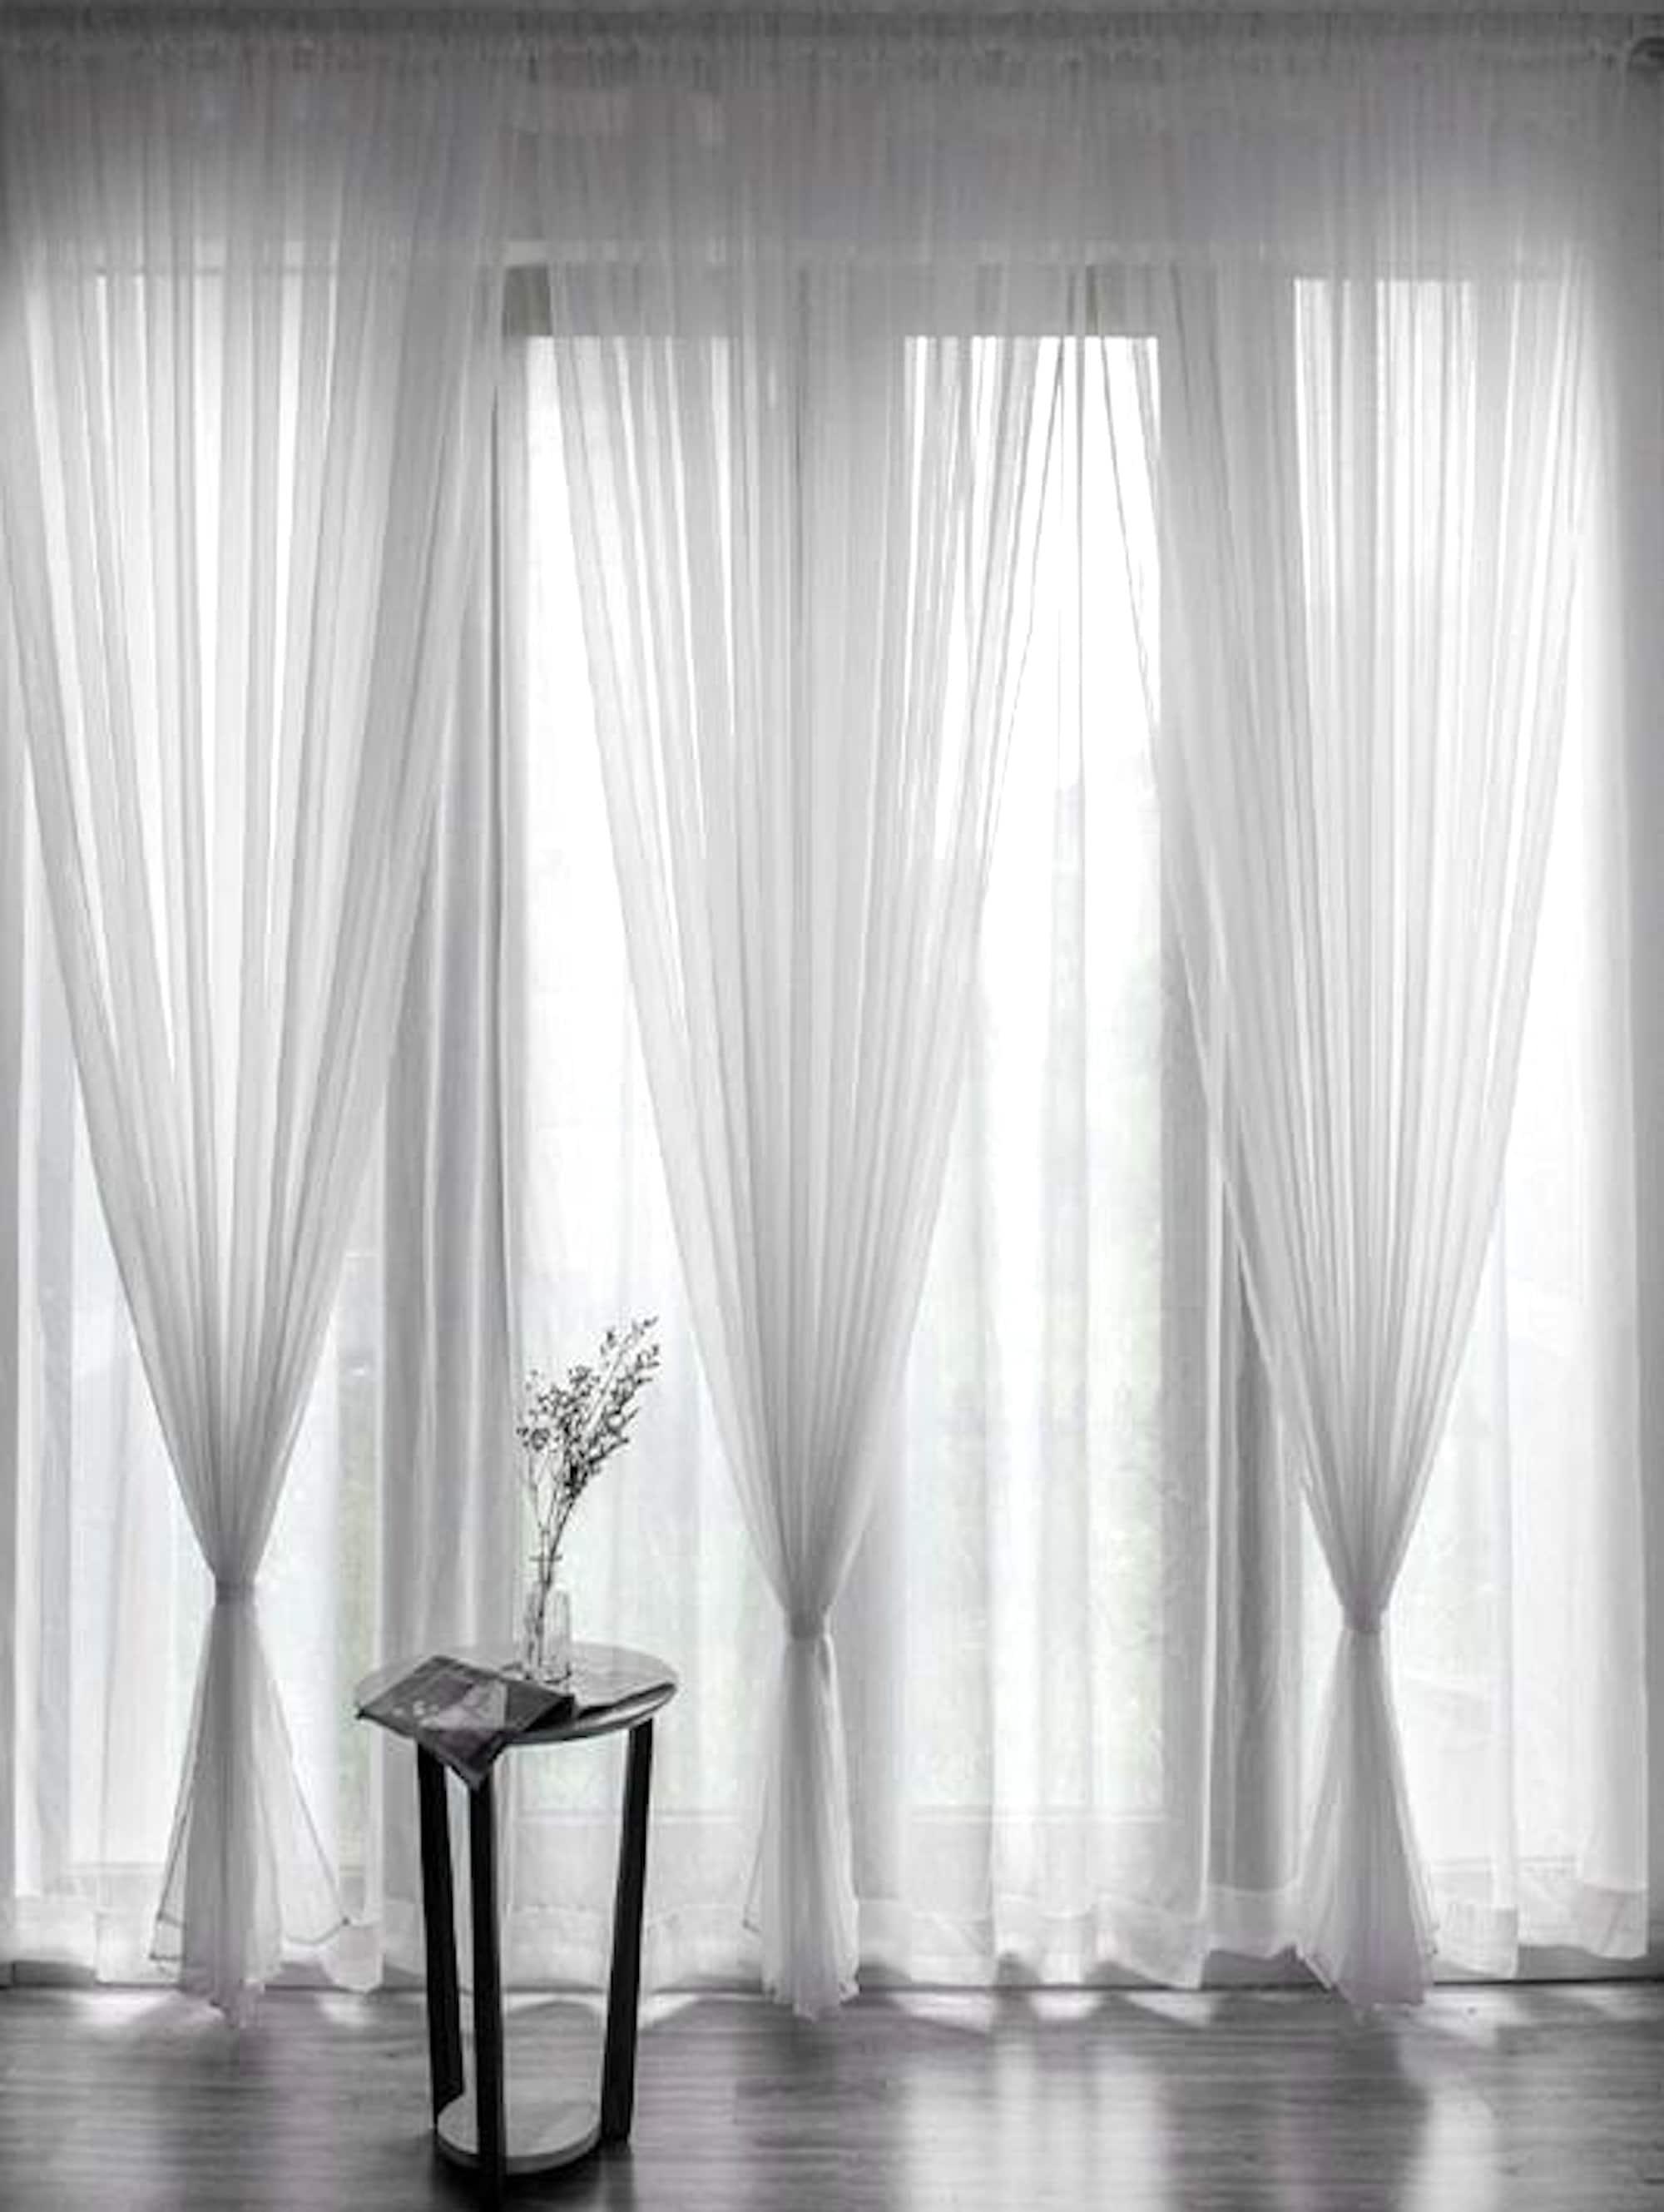 Voile Curtains Custom Window Curtain Panels Curtain Panels Sheer Curtains Dining Room Curtains Bedroom Curtains See Through Curtains